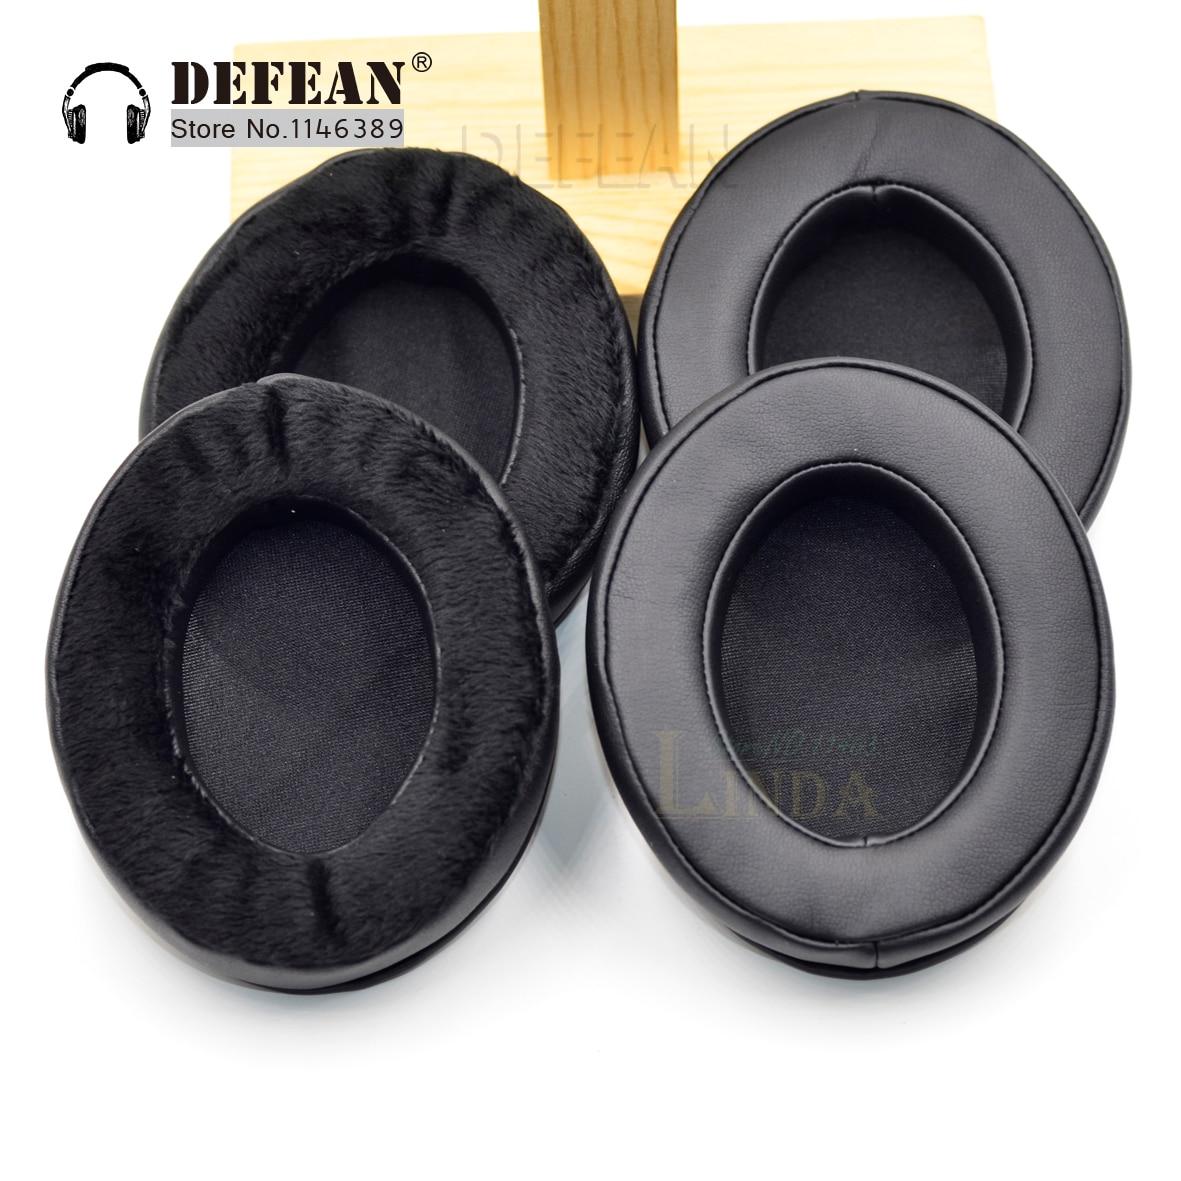 Repacement 105x85mm Soft Ear Pad Foam Sponge Cushion For TAKSTAR PRO 82 80 HI 2050 Professional Headset Headphones